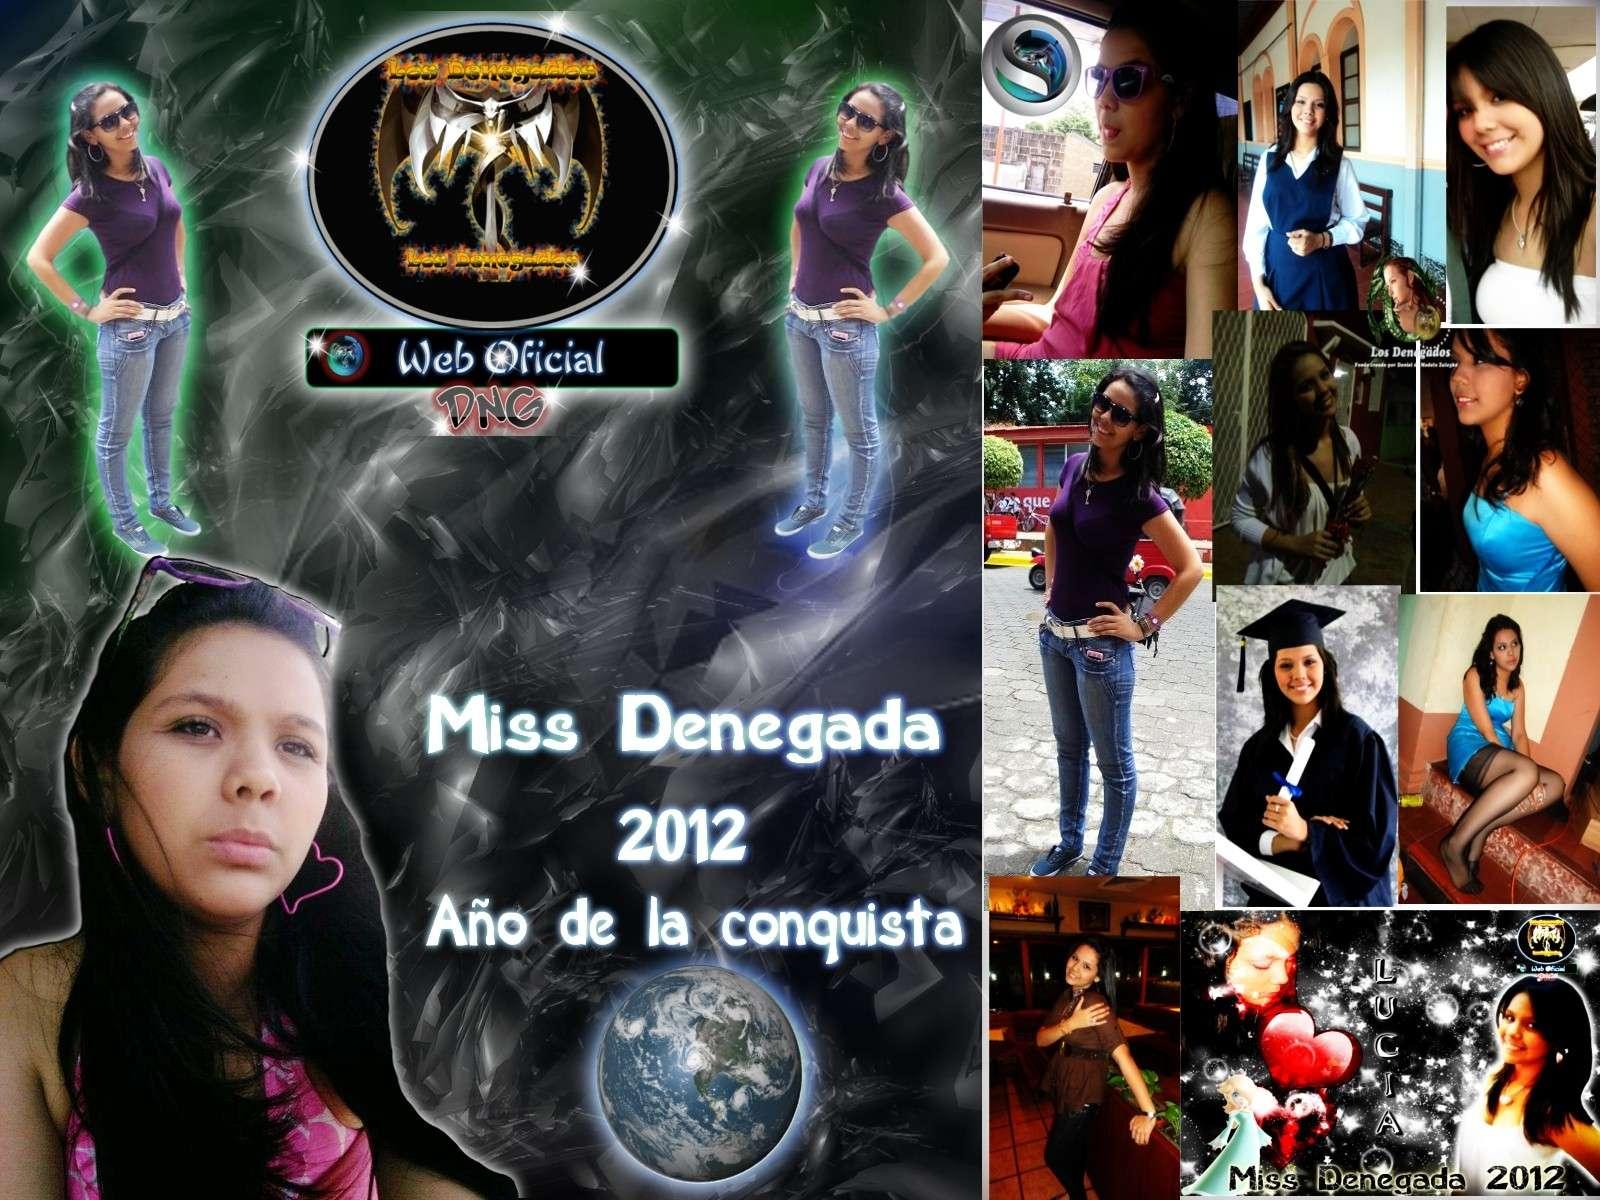 MIss Denegada 2012 Lucia Rosales ,  Año de la Conquista Miss2011